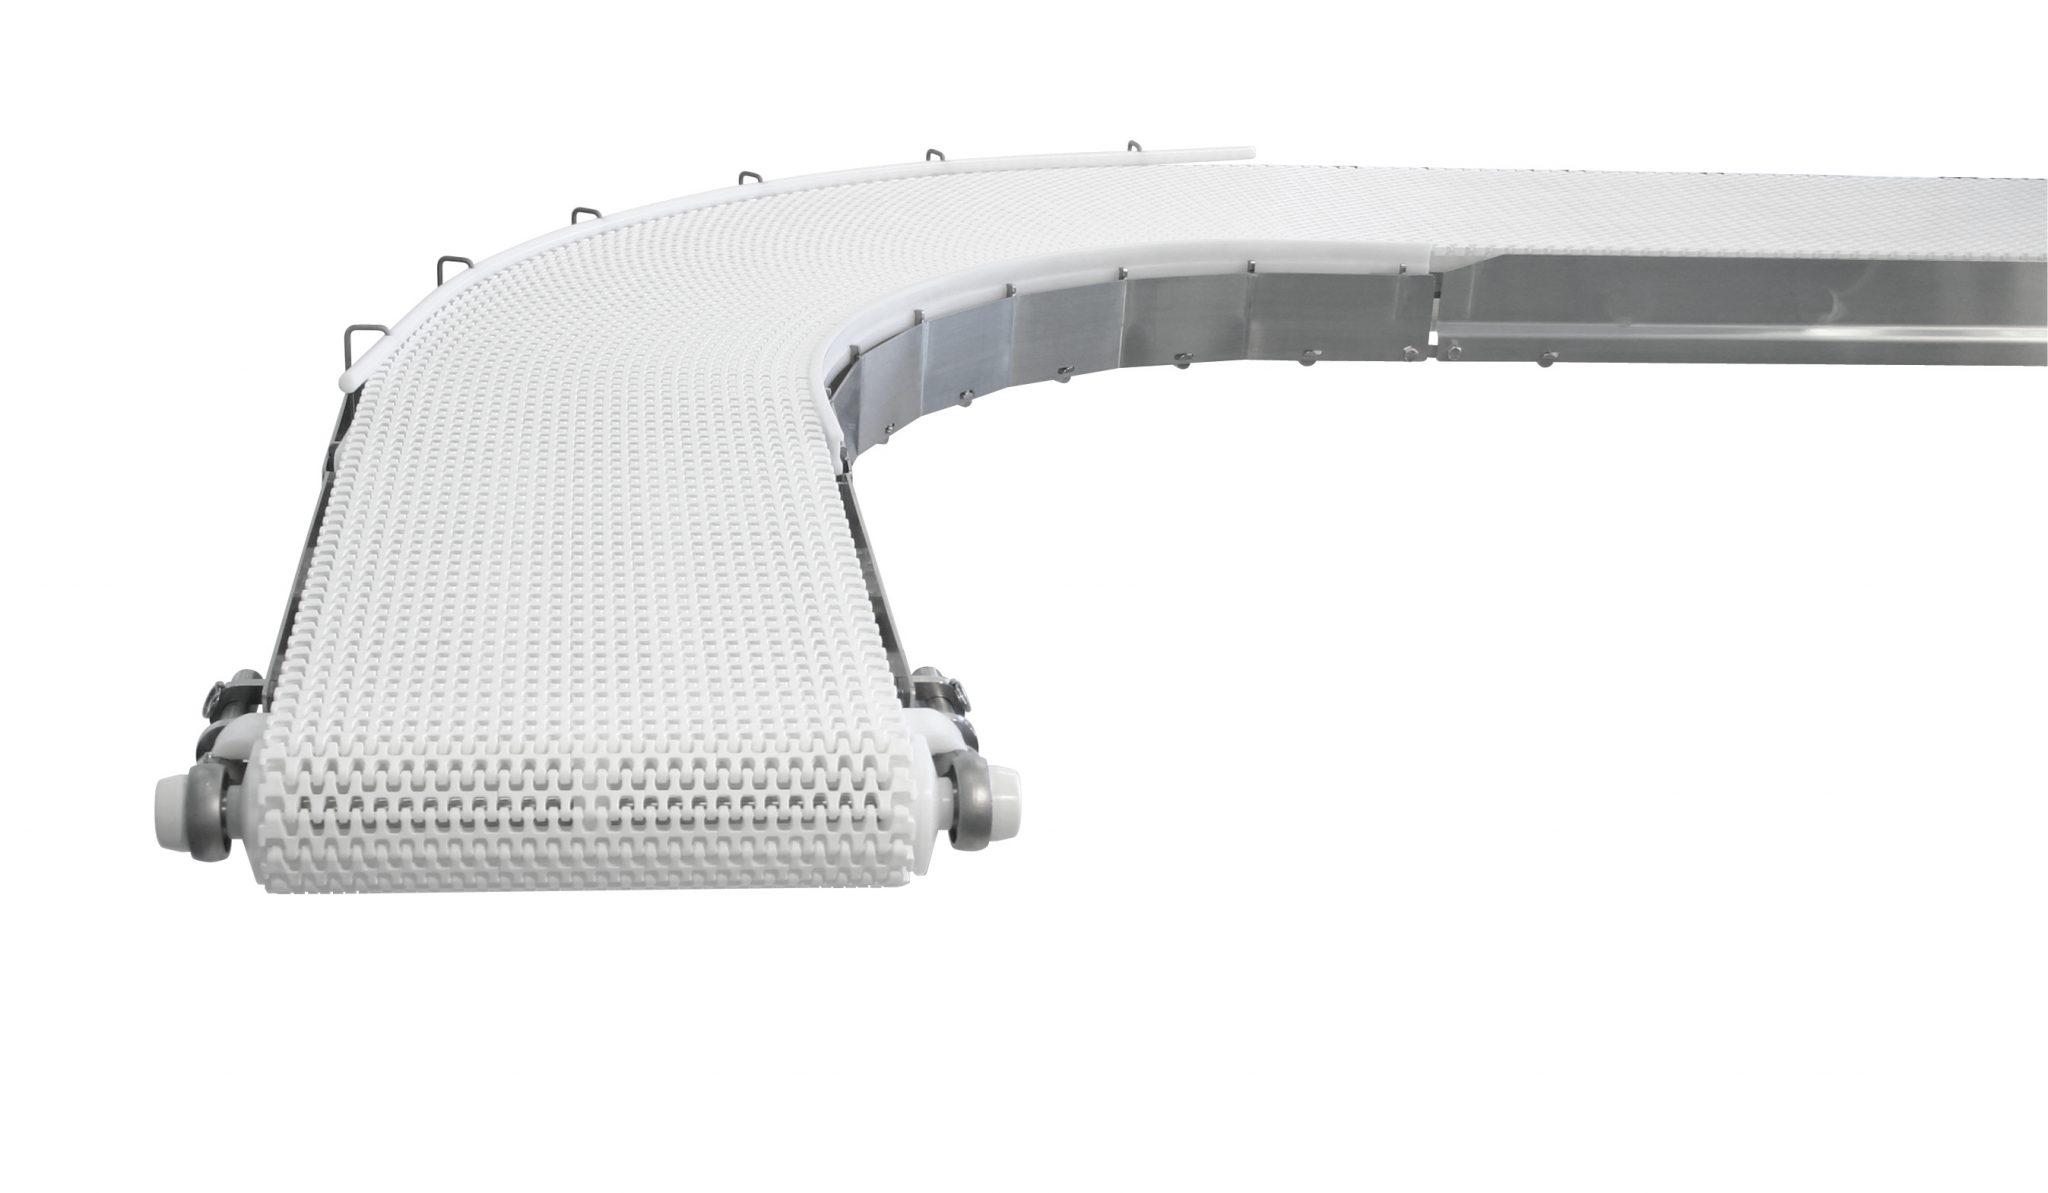 AquaGard 7400 Curve